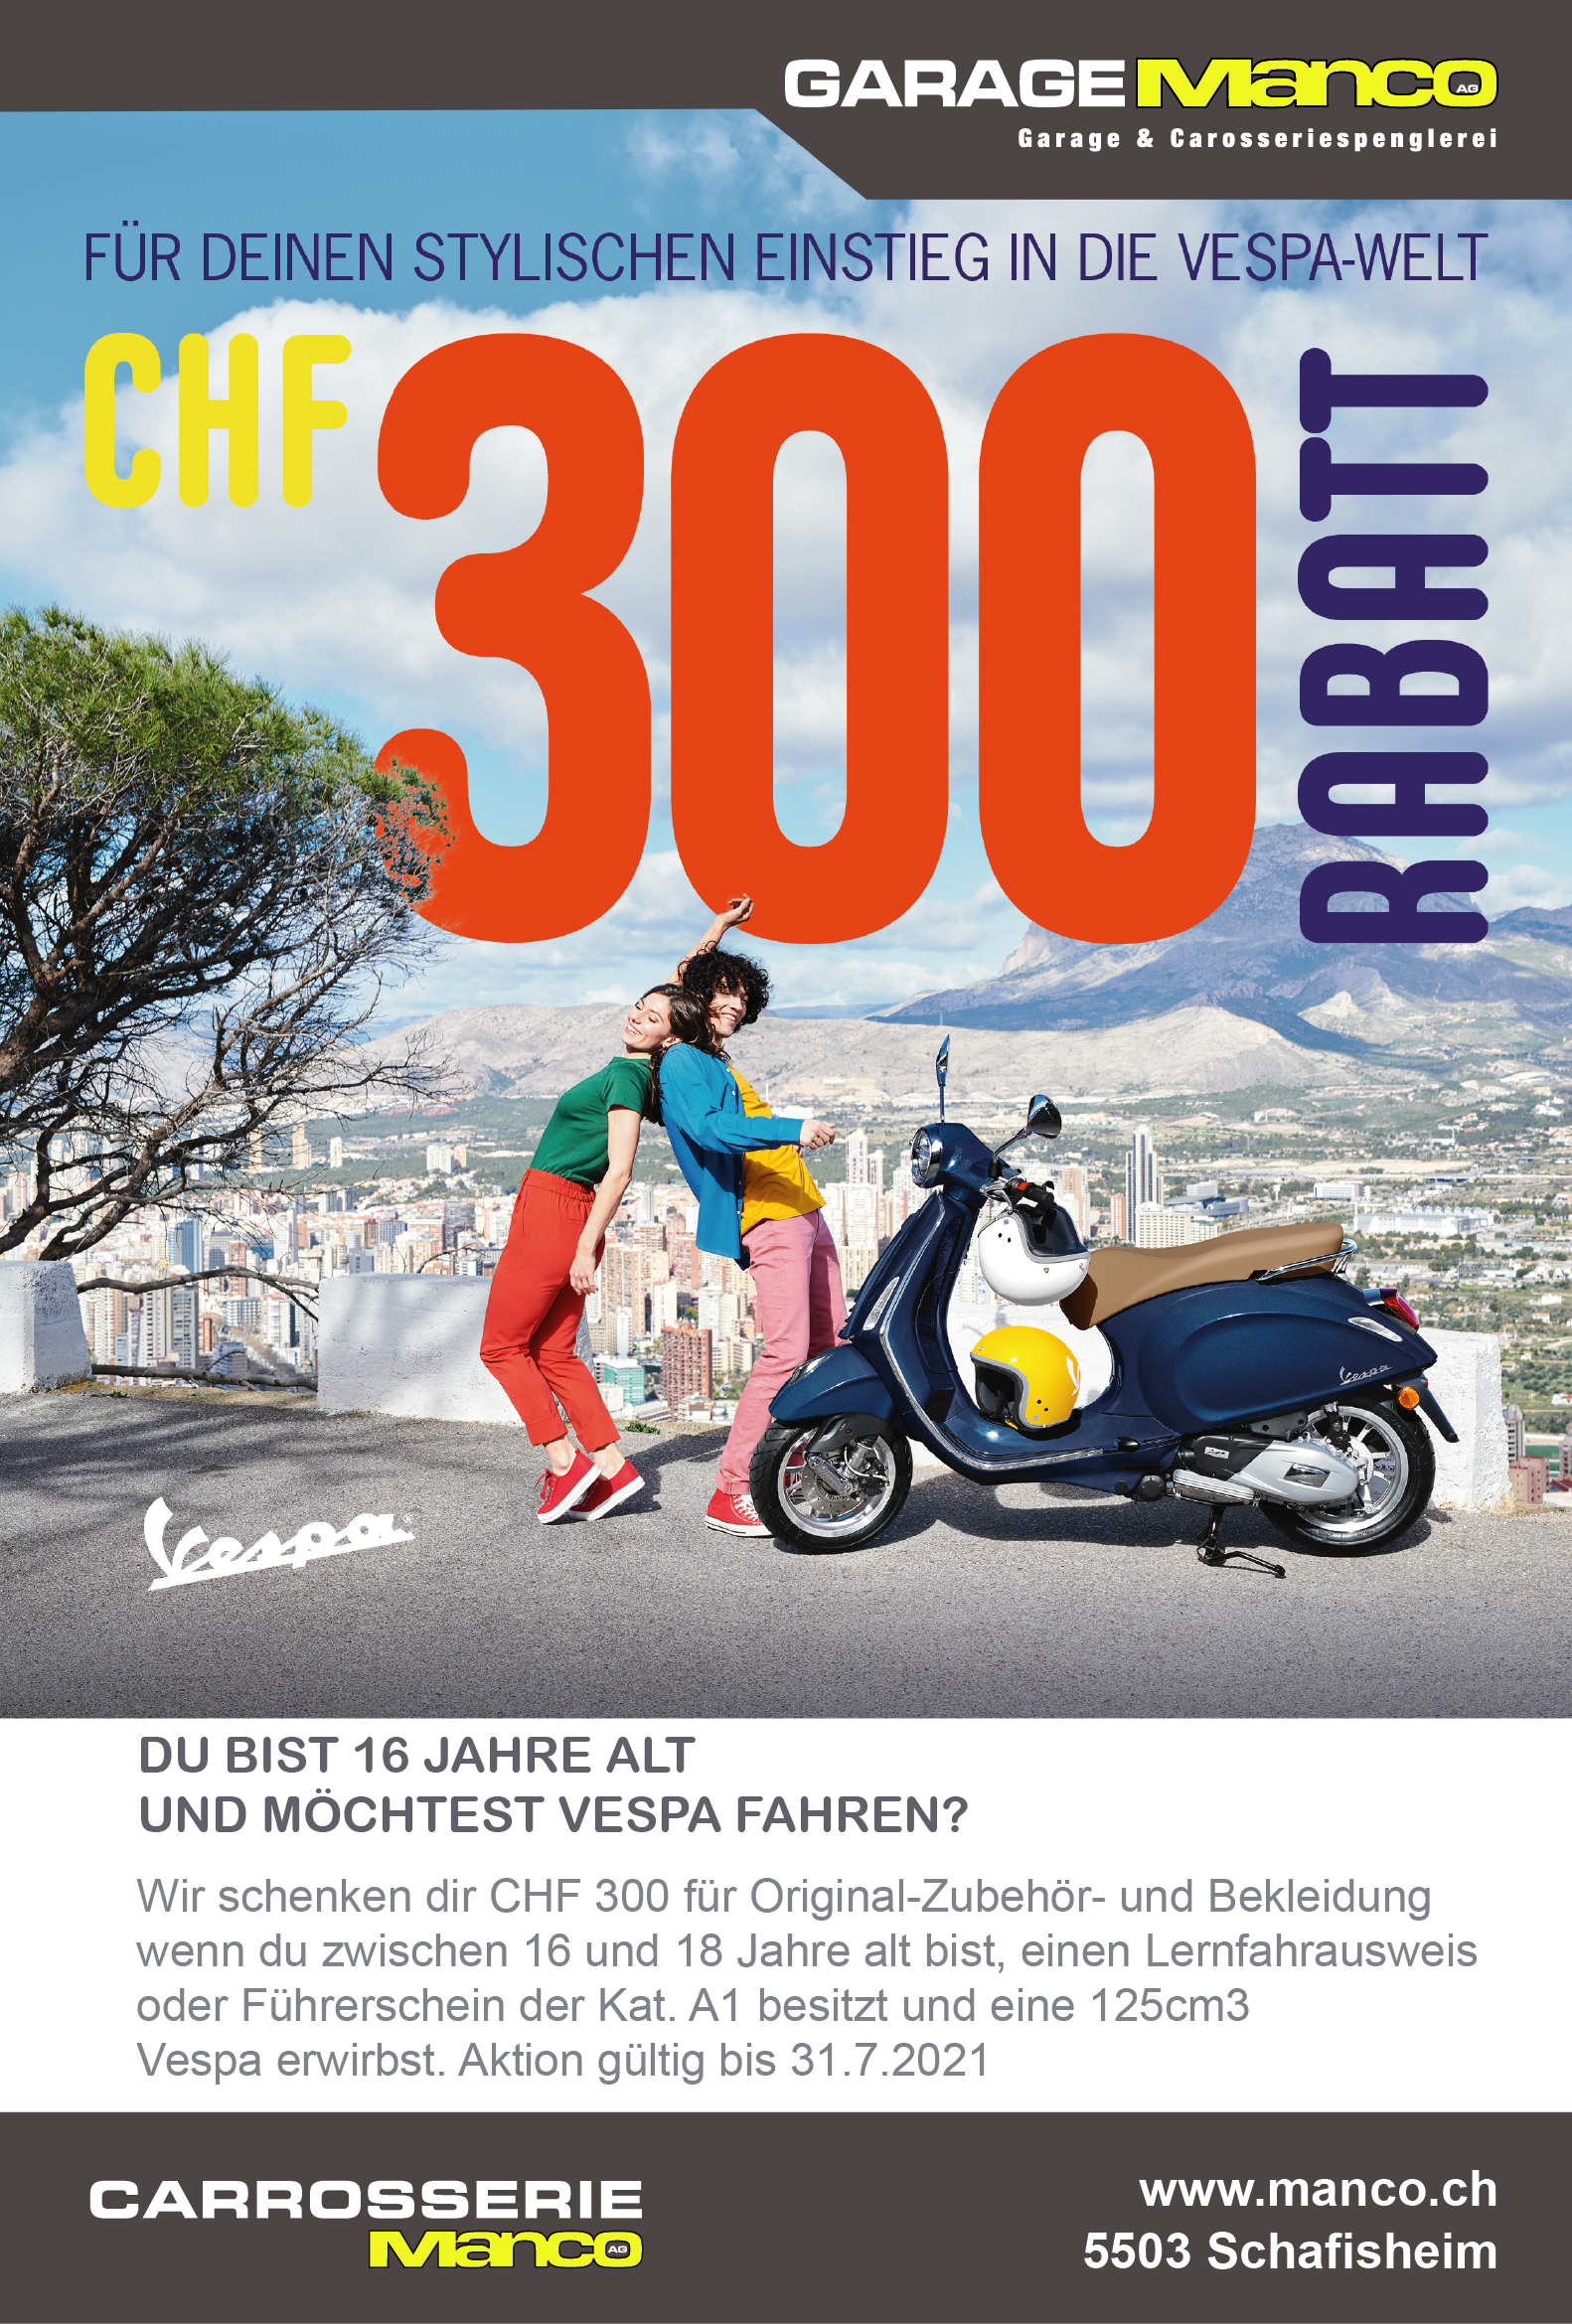 OFRAG_300CHF-Rabatt_IG-Banner_1080x1080px_Vespa_d